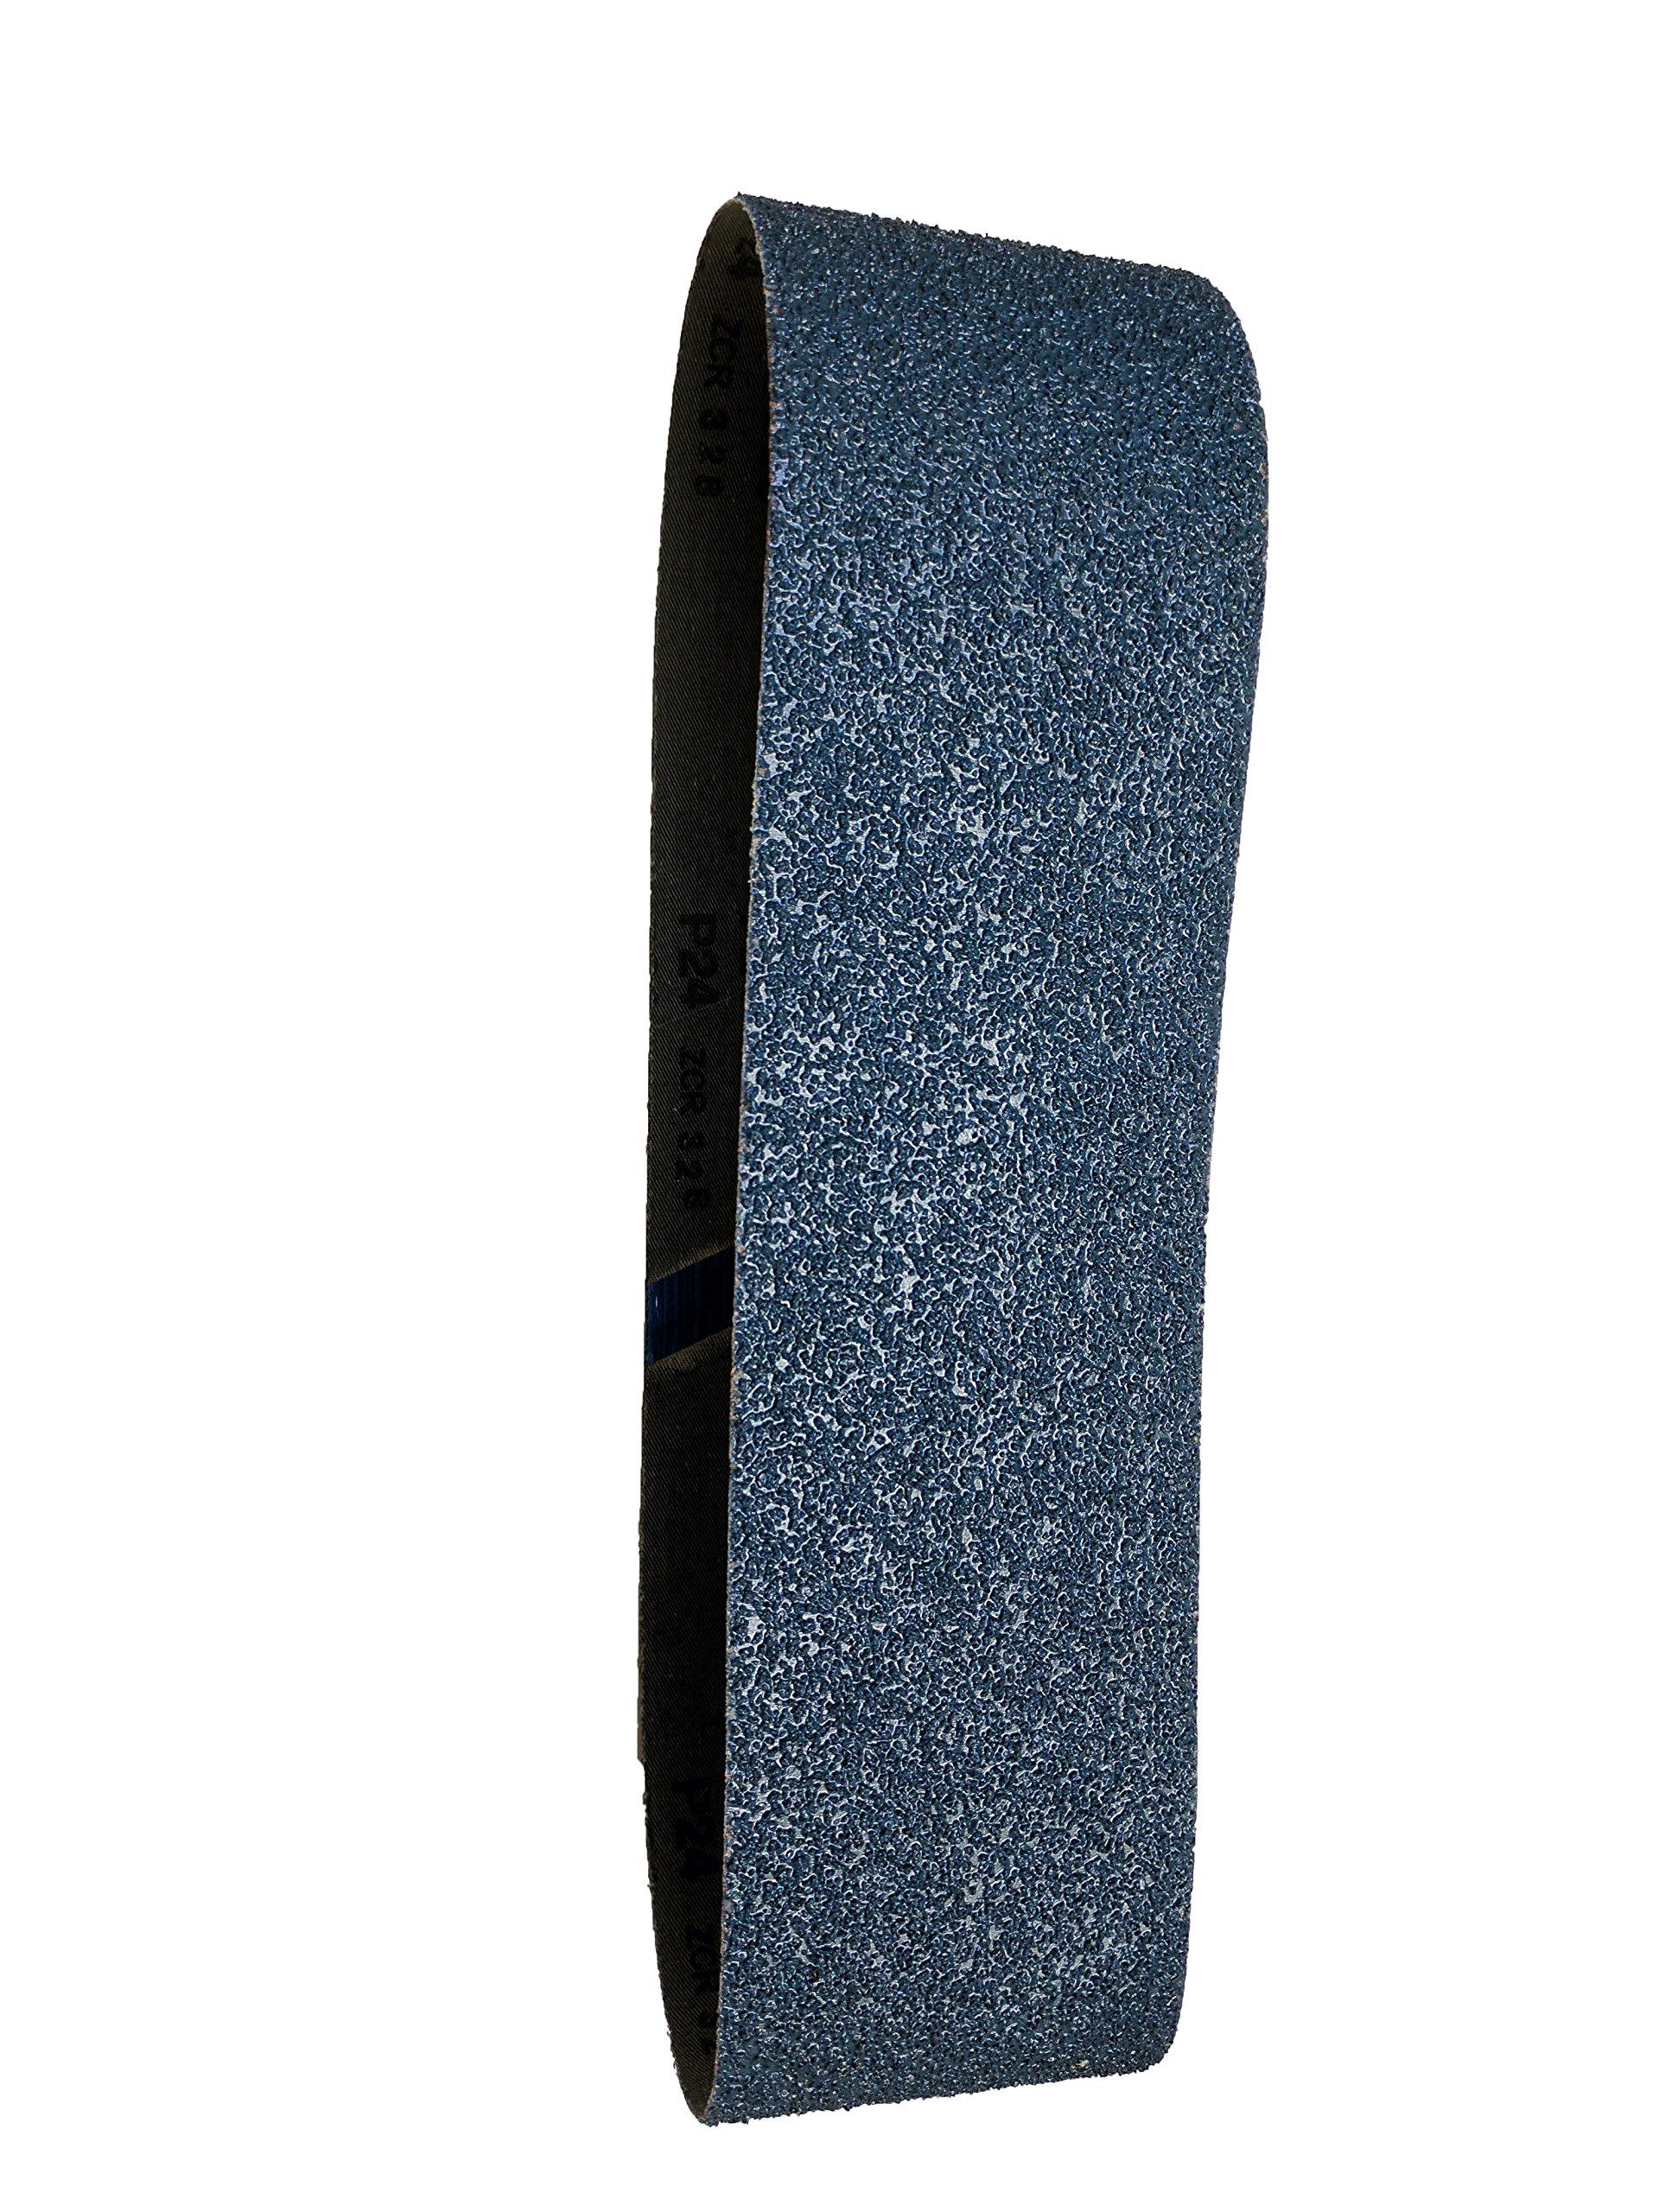 Sungold Abrasives 67851 Blue Zirconia Cloth 40 Grit Sanding Belts (6 Pack), 2 x 42''